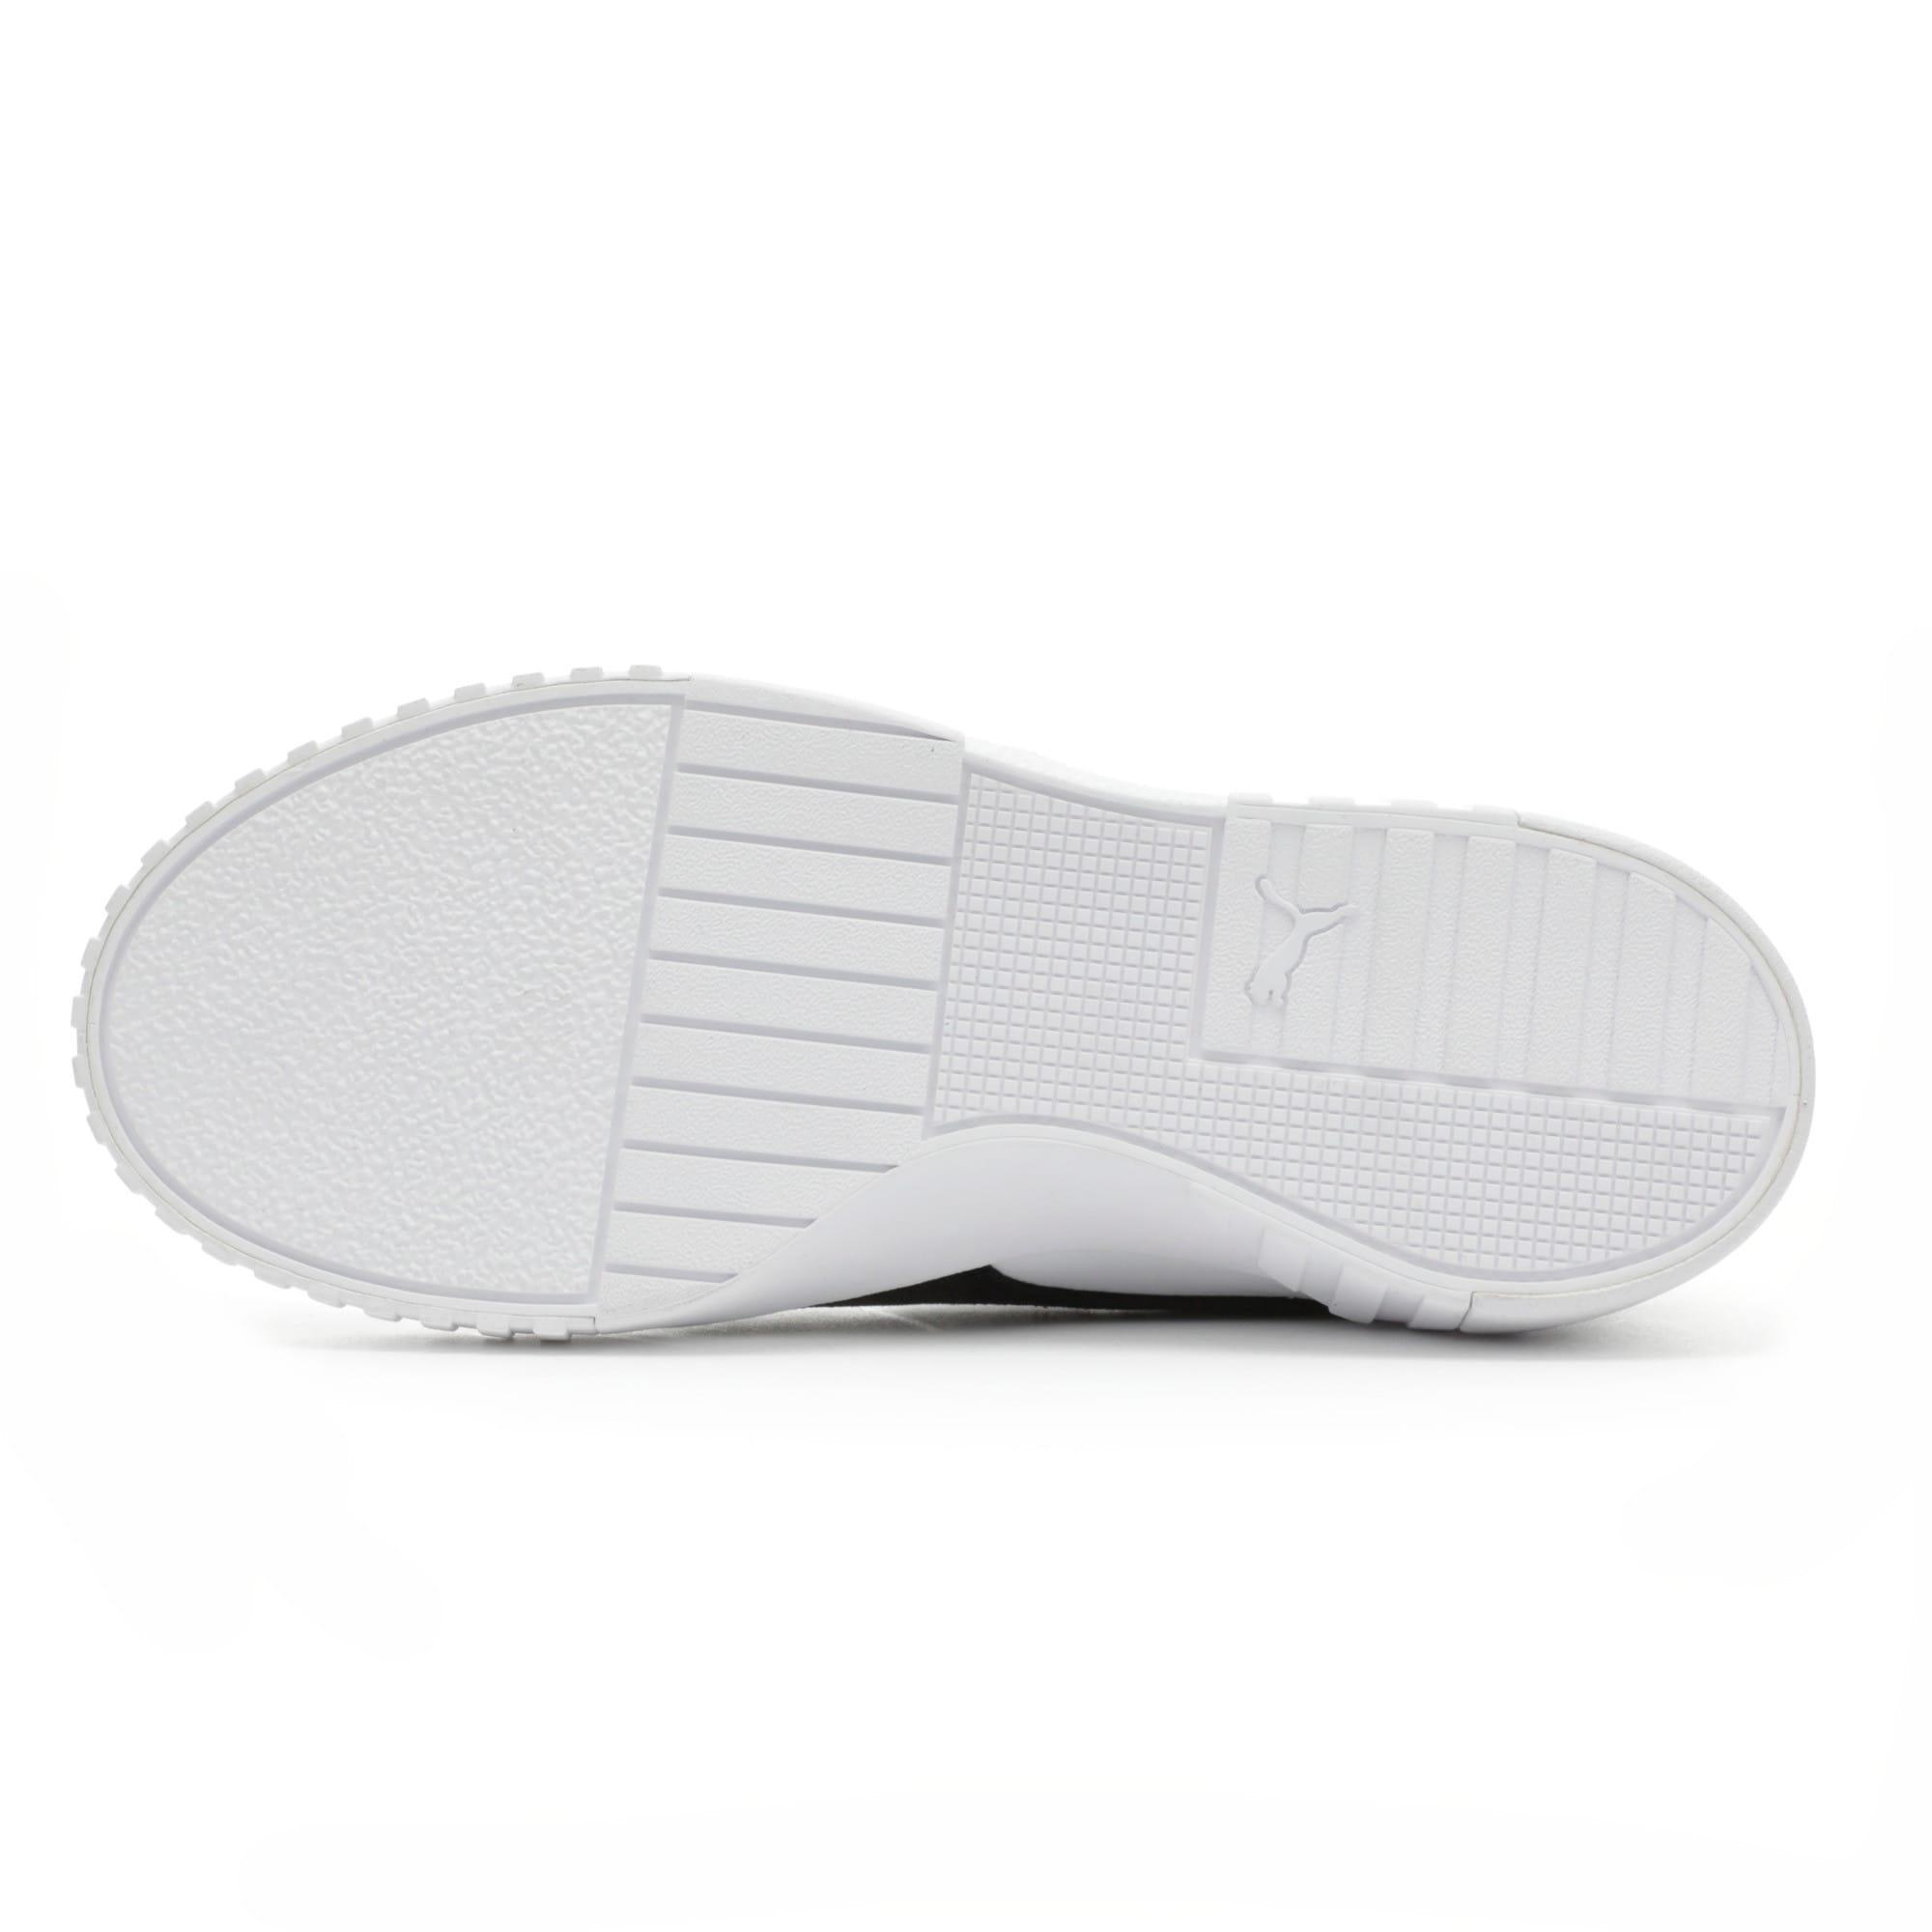 Thumbnail 5 of SG x Cali B+W Women's Sneakers, Puma White-Puma Black, medium